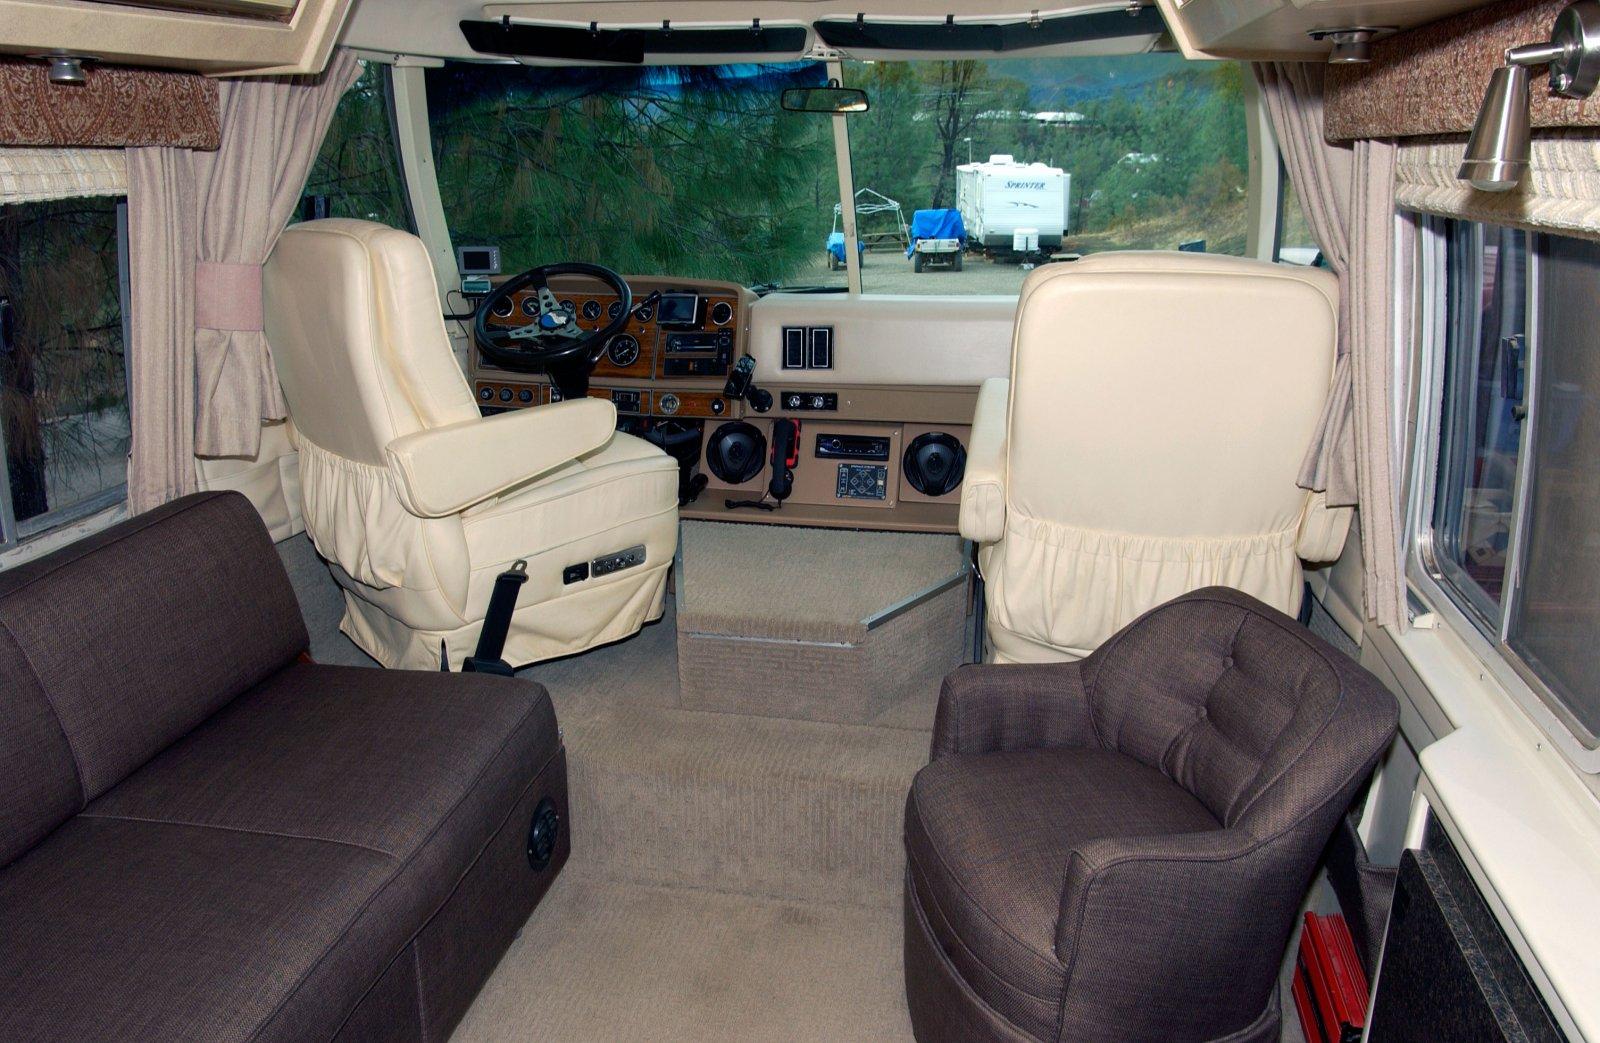 Click image for larger version  Name:Salon-Cab-web.jpg Views:90 Size:316.4 KB ID:225287